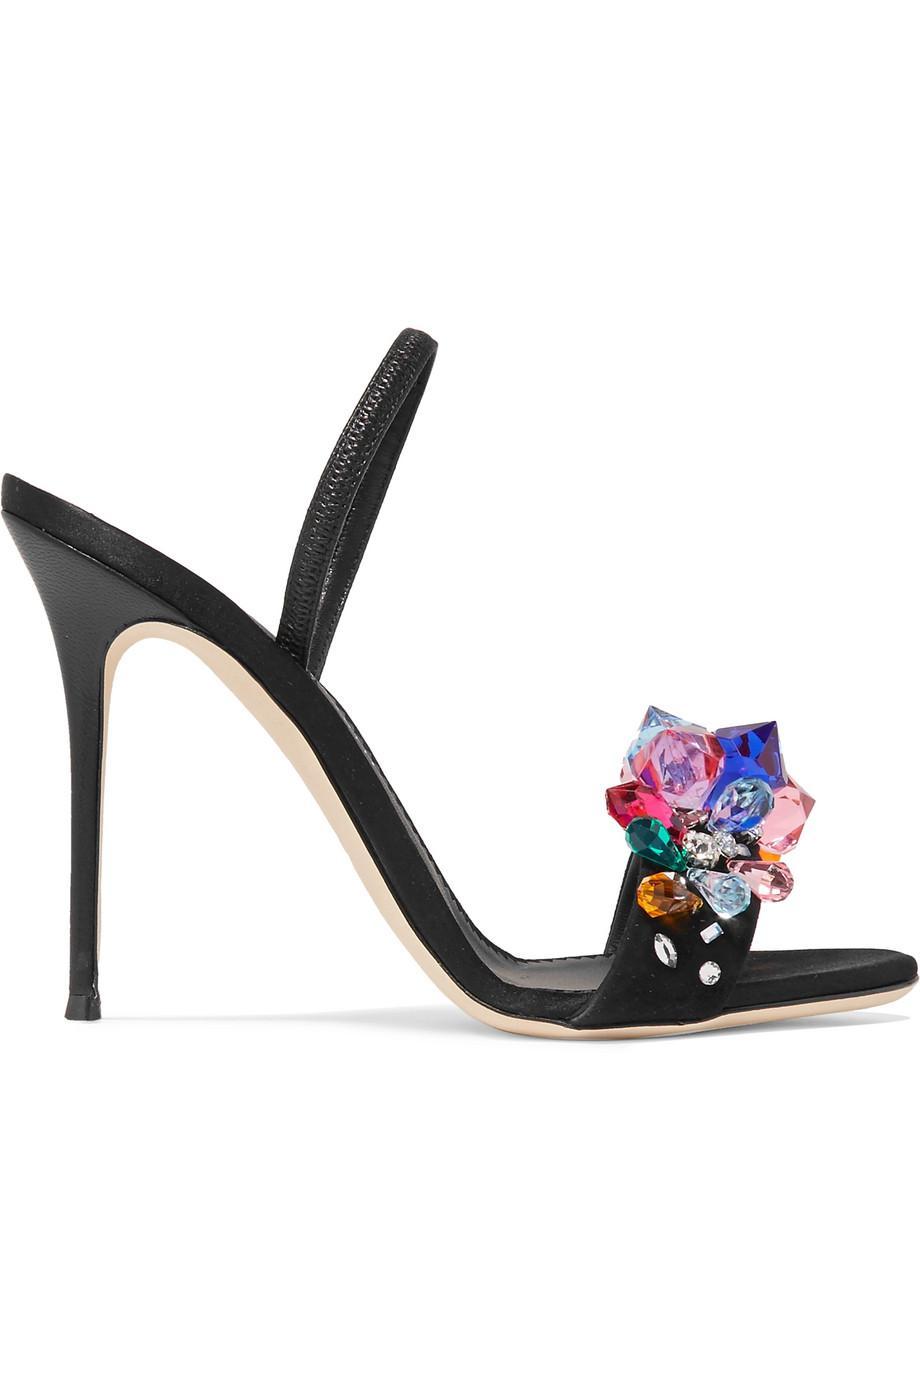 Mistico Crystal-embellished Satin Slingback Sandals - Black Giuseppe Zanotti TtpSSOz4wd